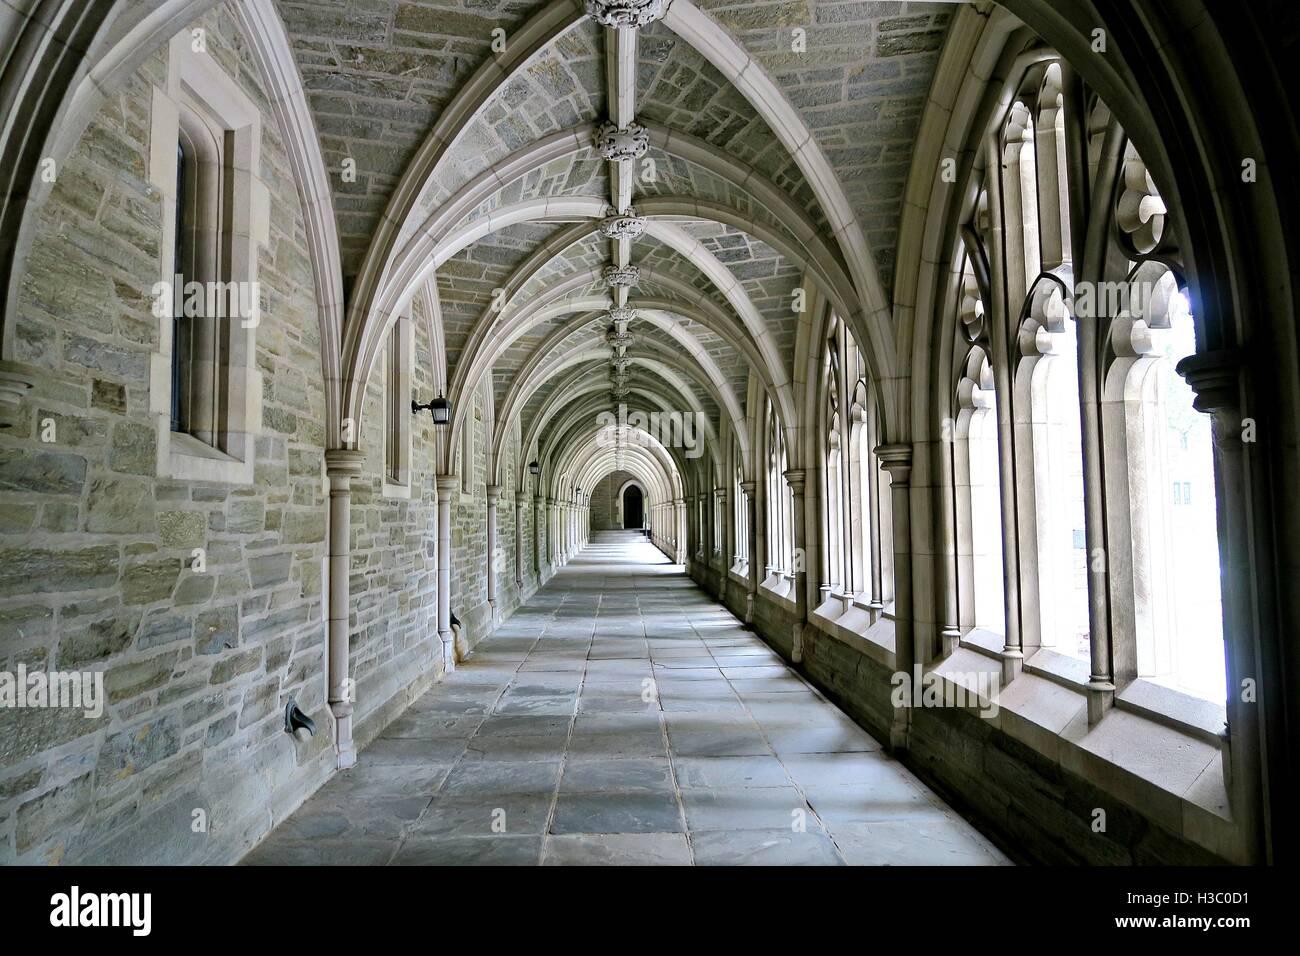 Princeton University - Stock Image